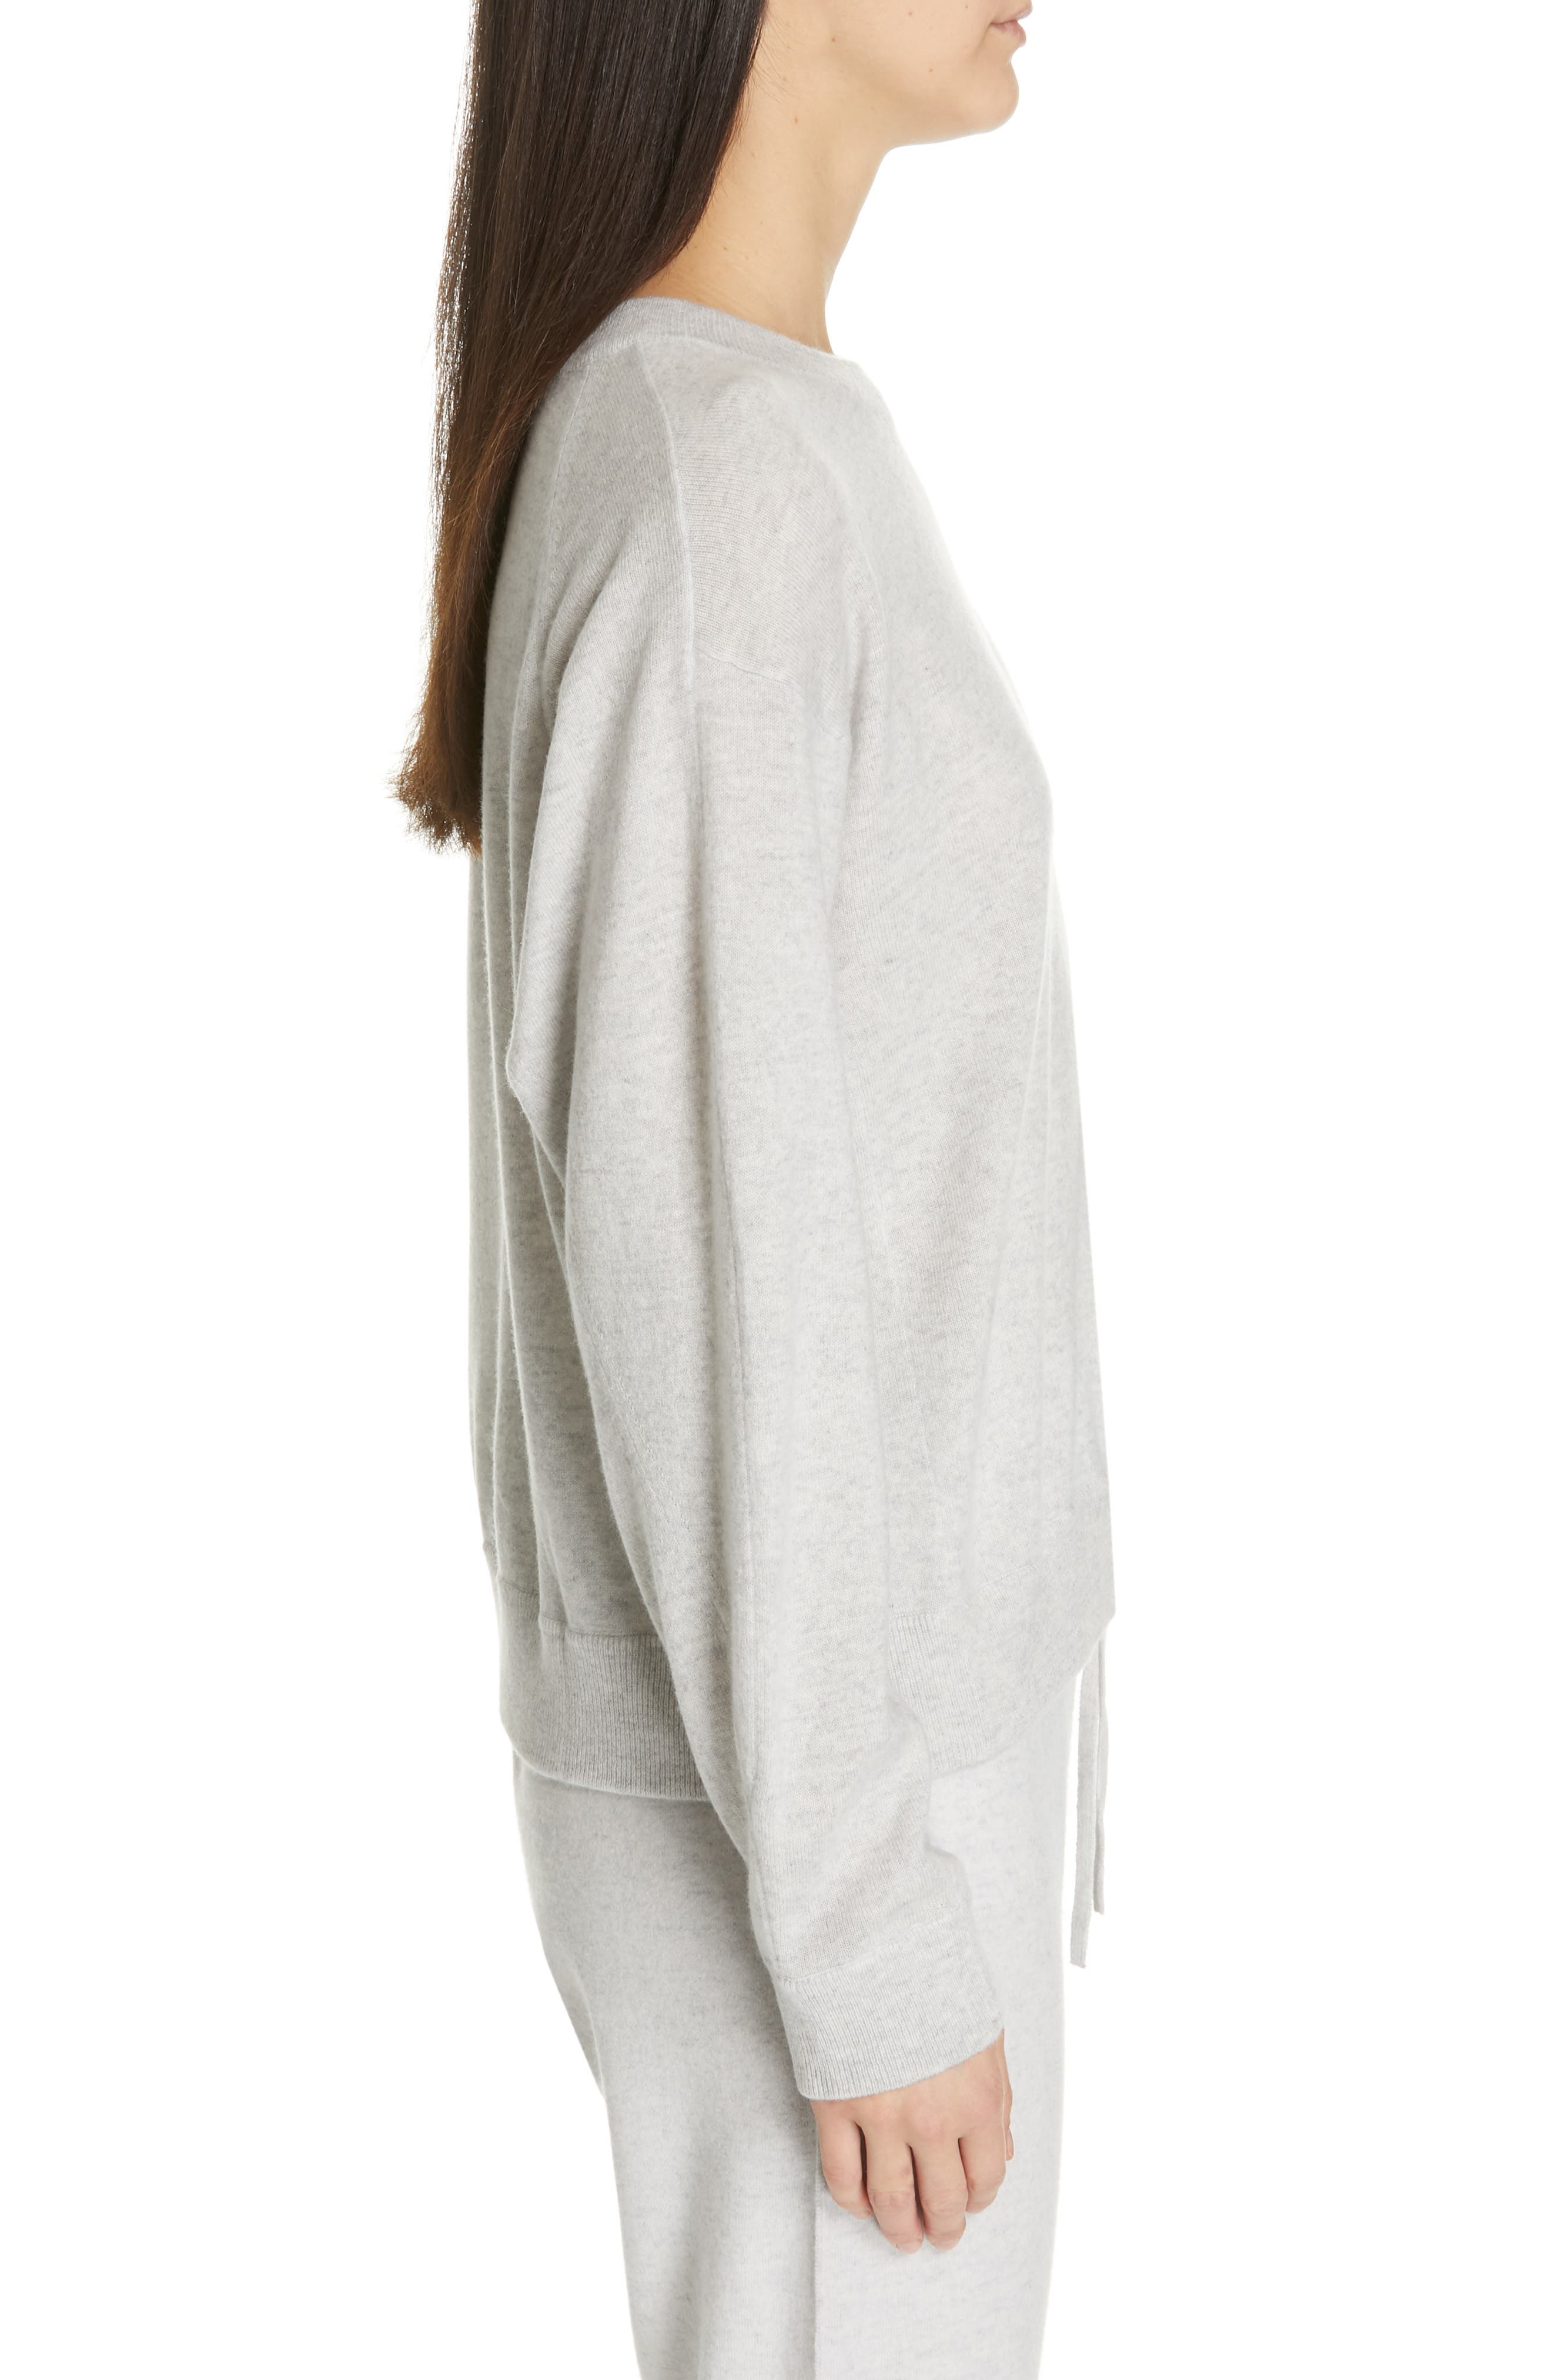 VINCE, Boxy Cashmere Sweater, Alternate thumbnail 3, color, LIGHT HEATHER GREY